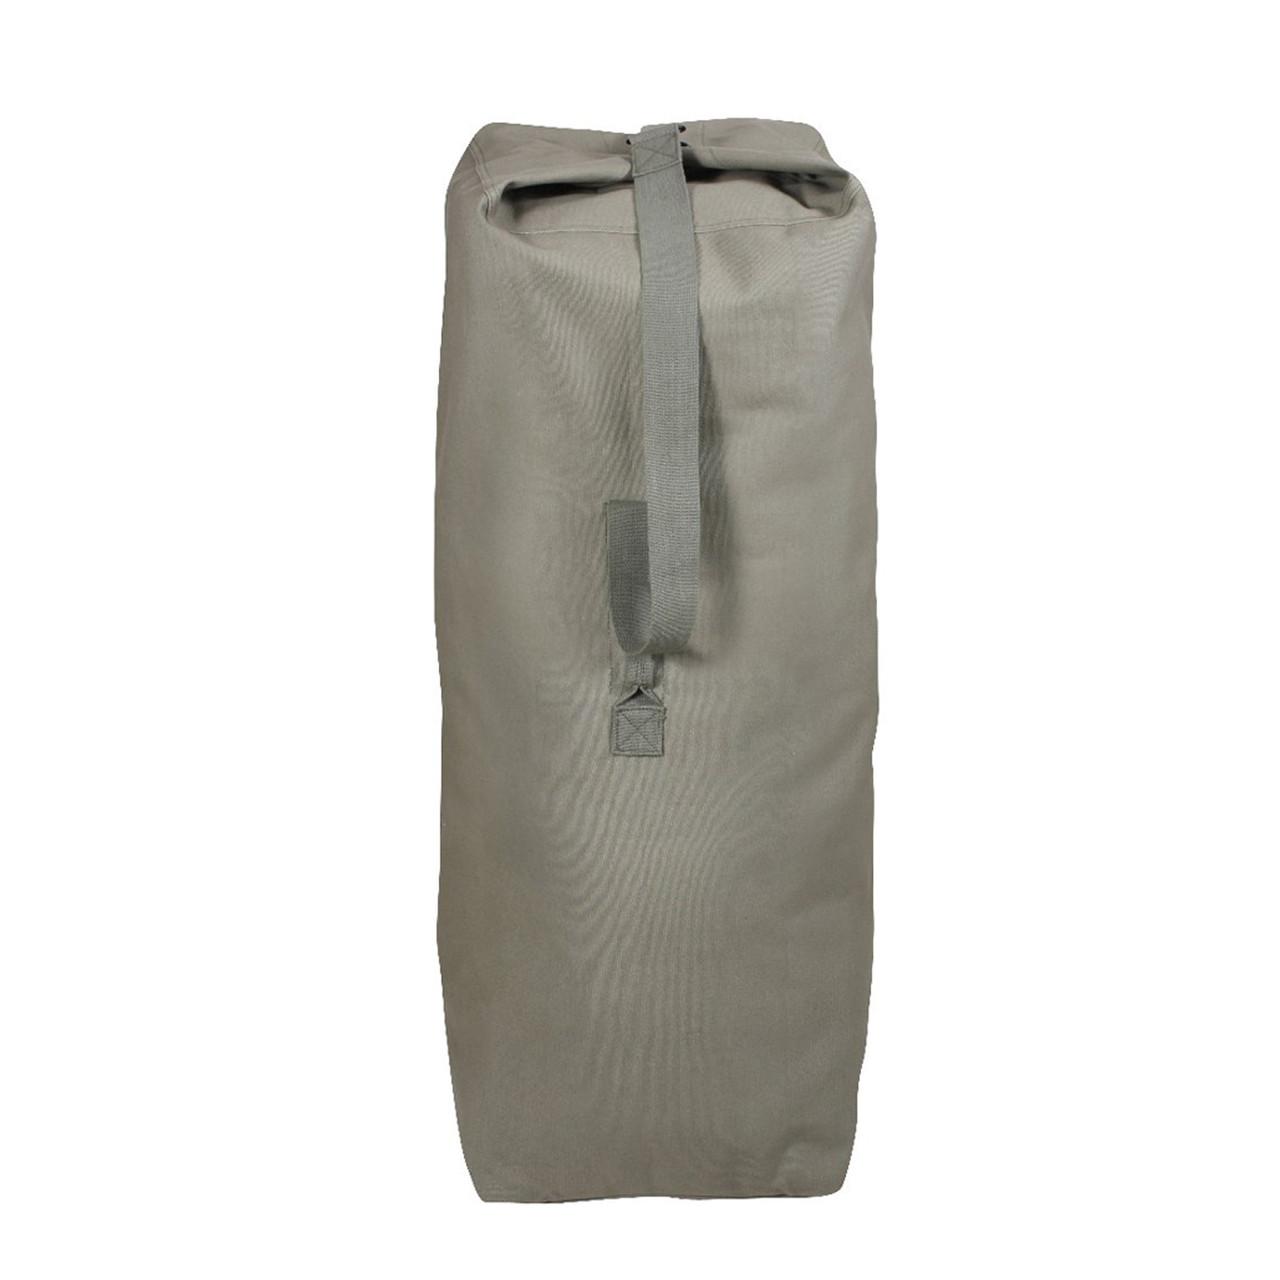 5d240b956 Shop Heavyweight Top Load Duffle Bags - Fatigues Army Navy Gear